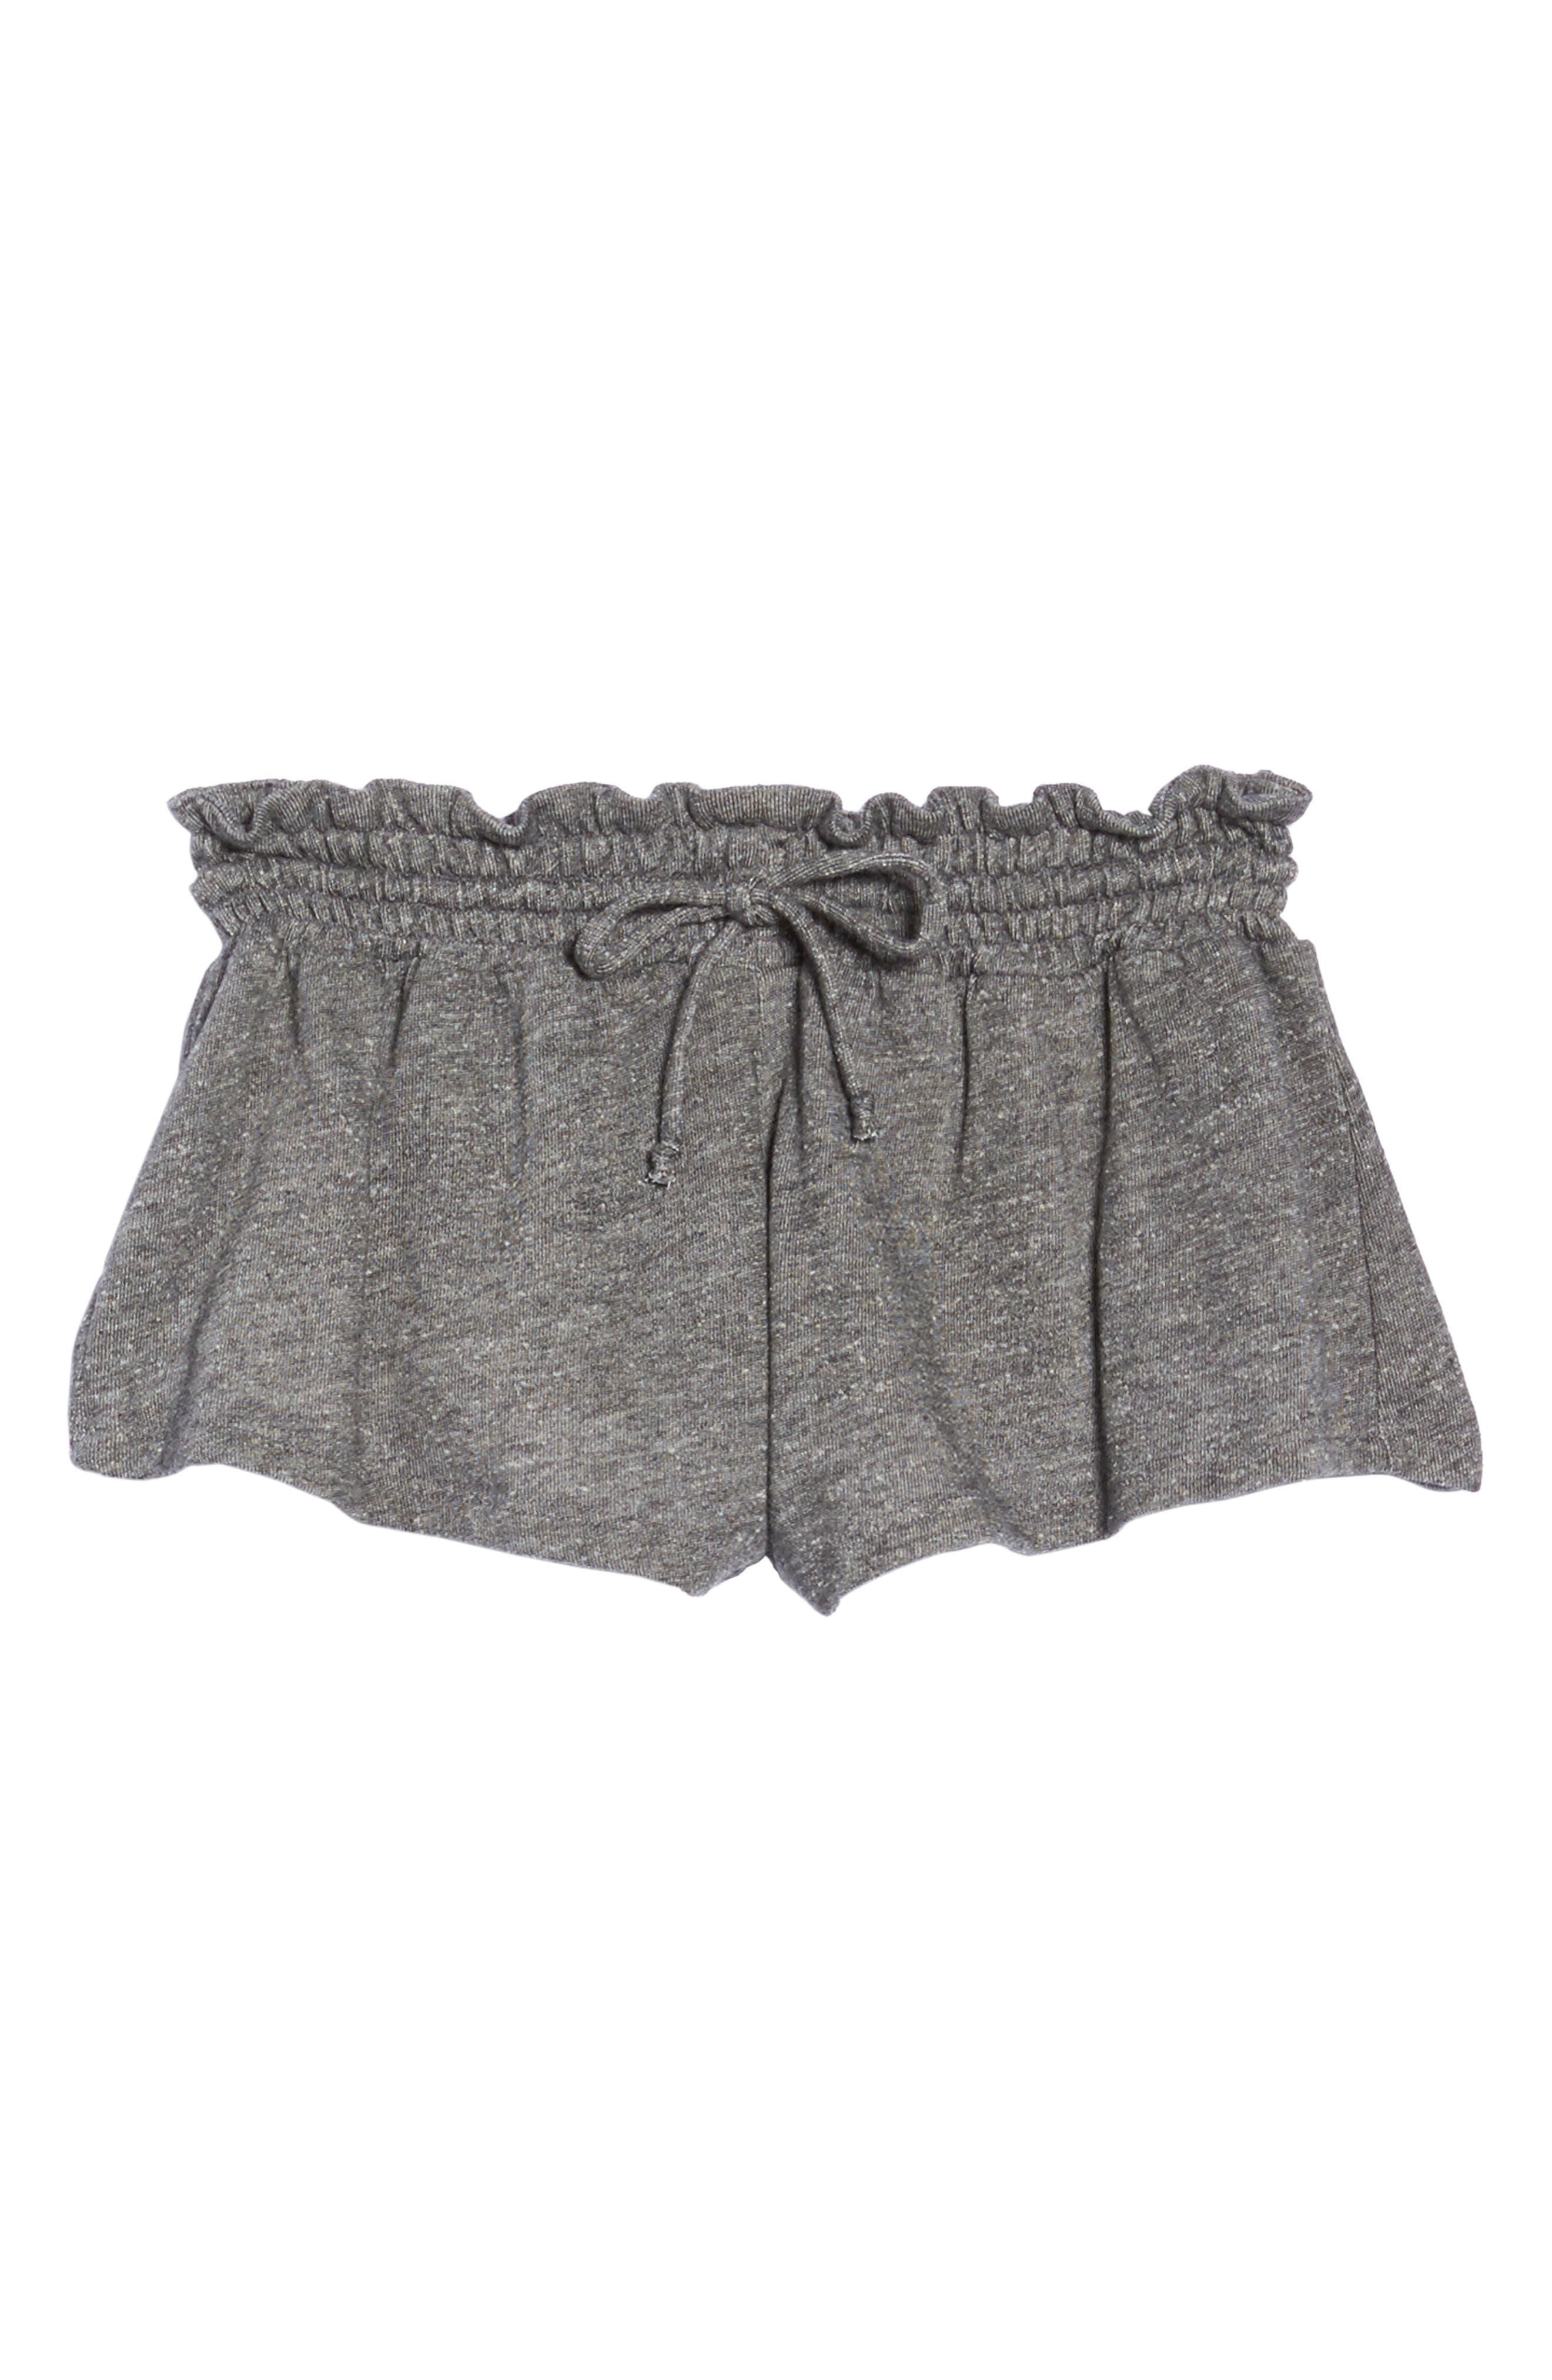 Alternate Image 4  - Olympia Theodora Dallas Shorts